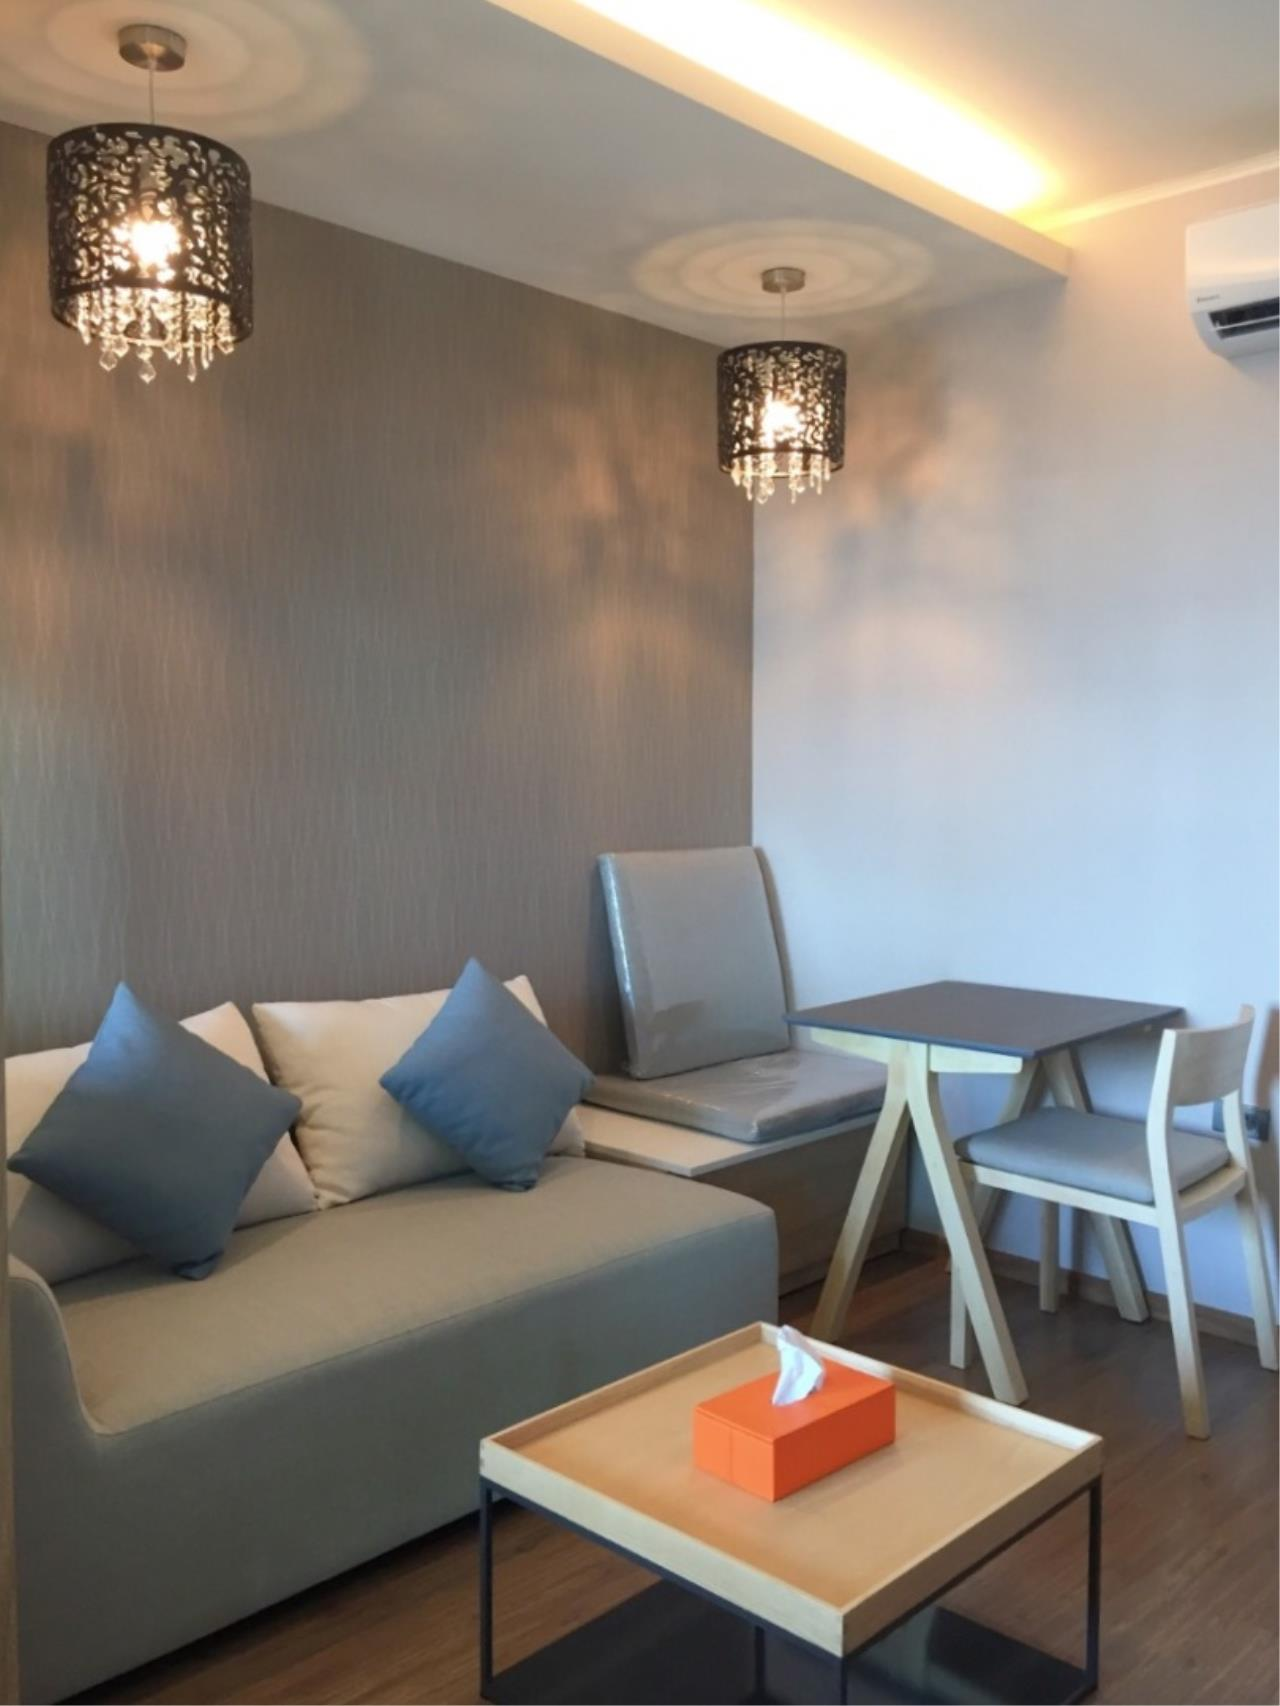 Century21 Skylux Agency's U Delight Residence Riverfront Rama 3 / Condo For Sale / 1 Bedroom / 35 SQM / BTS Saphan Taksin / Bangkok 1